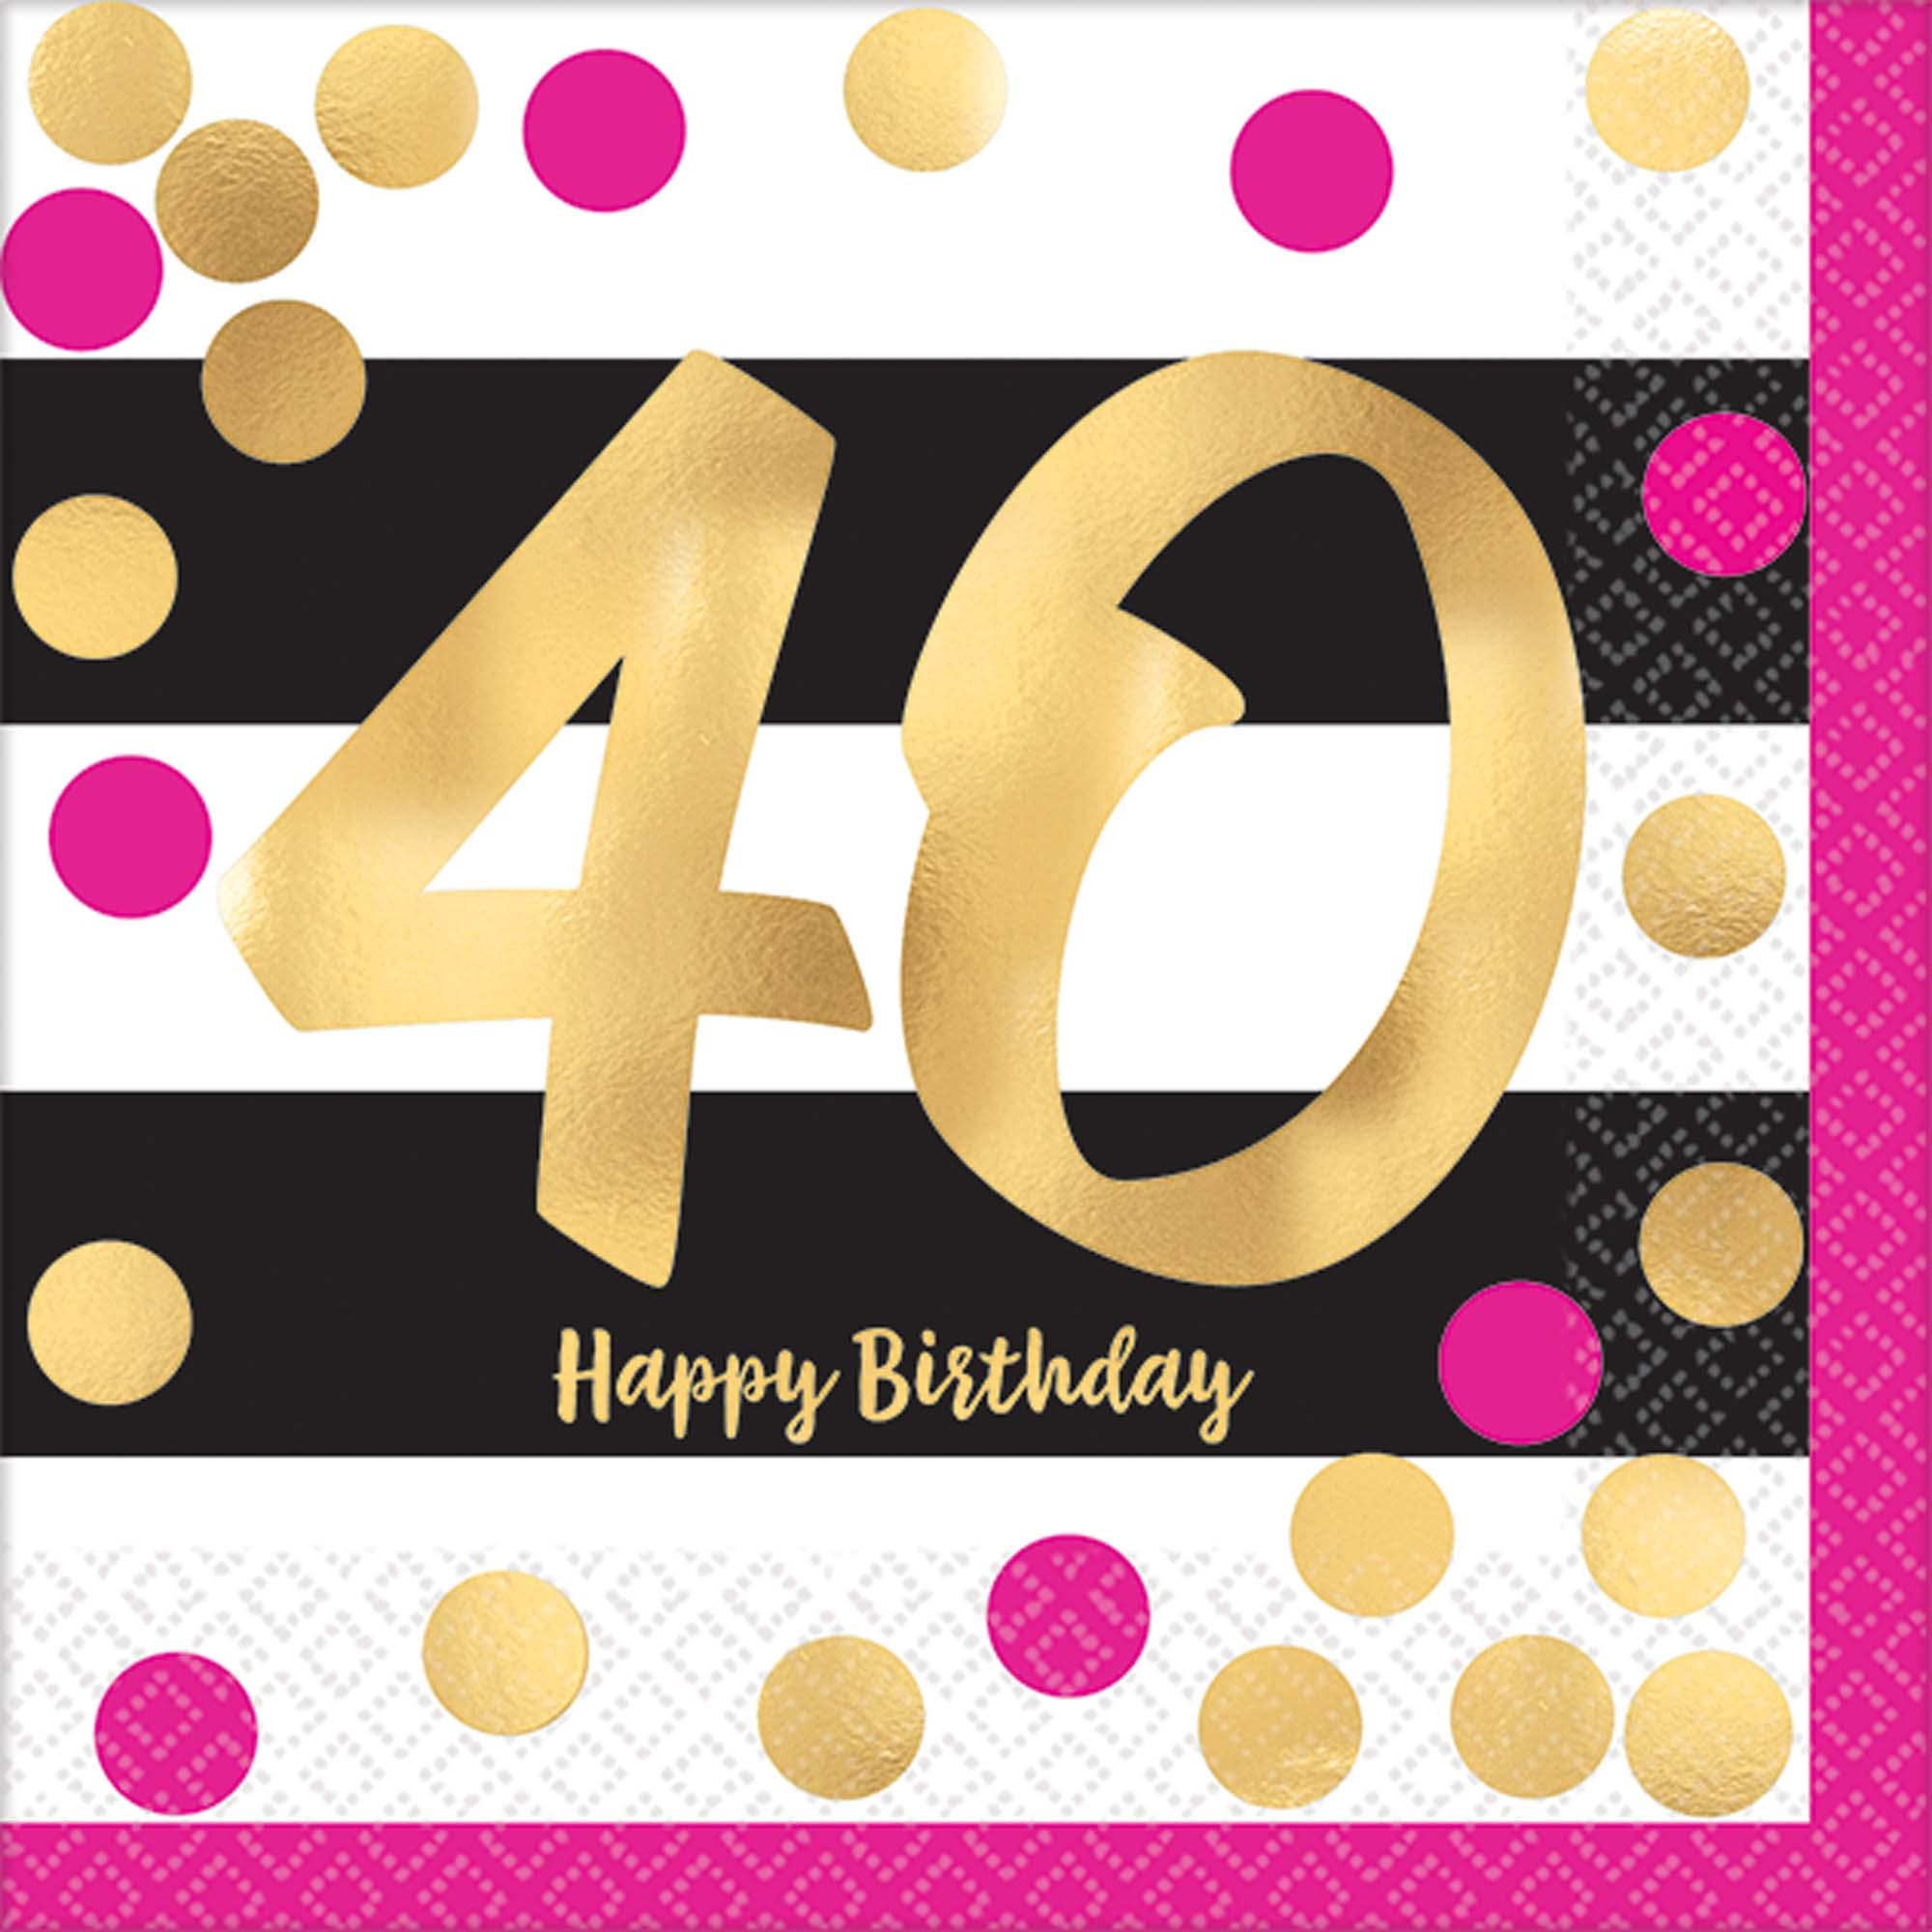 hight resolution of 40th birthday pink gold metallic beverage napkins 16